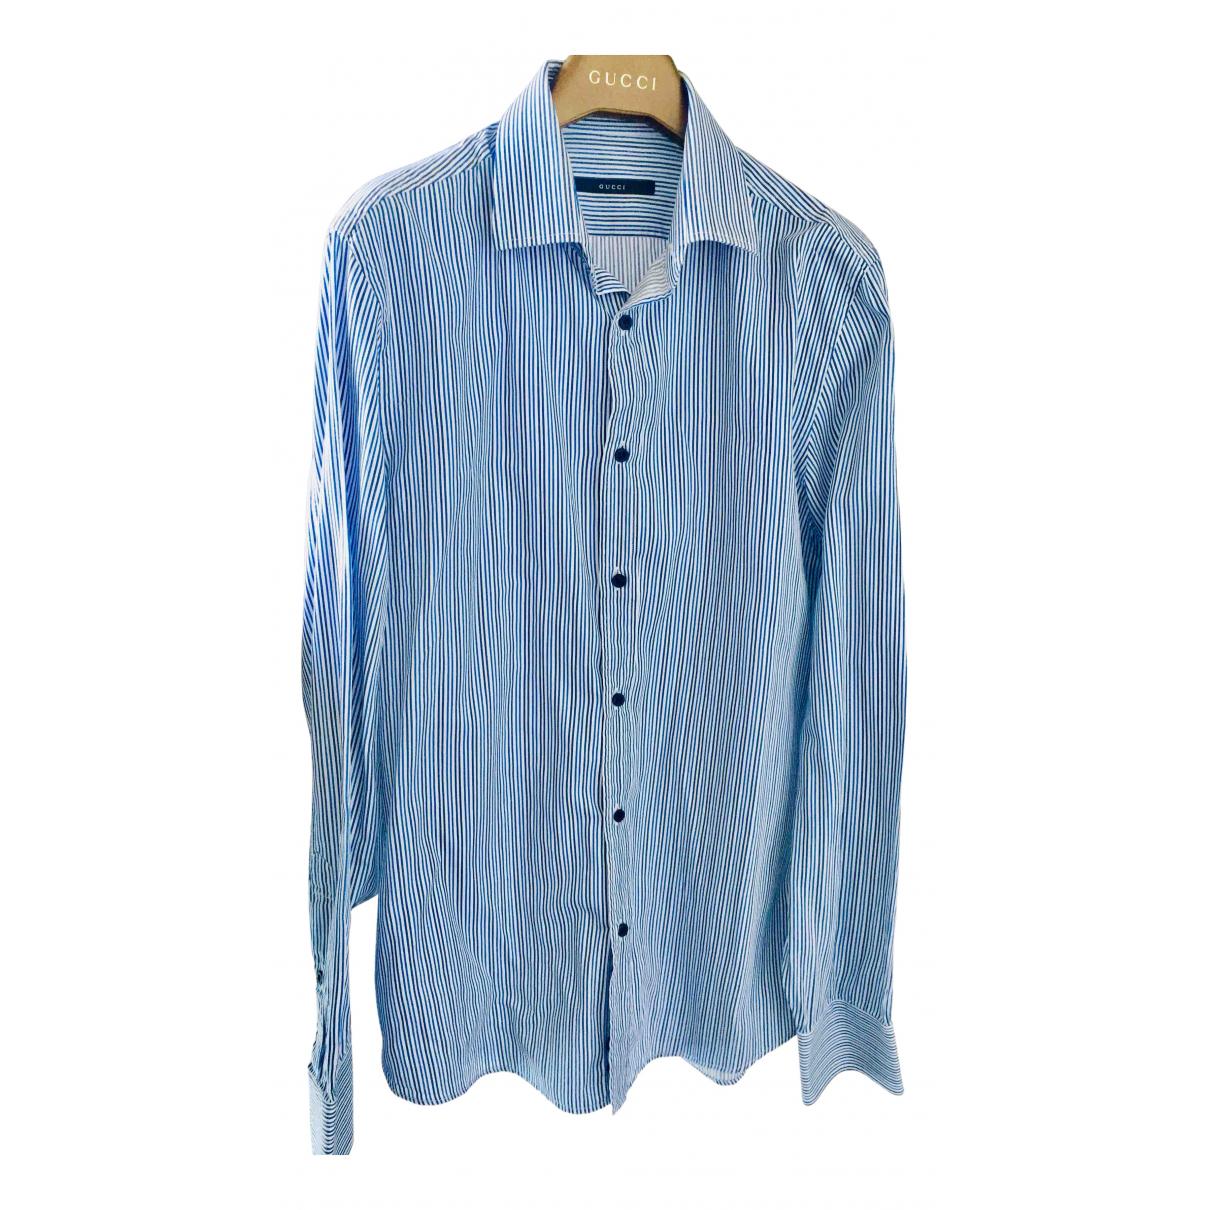 Gucci N Navy Cotton Shirts for Men 39 EU (tour de cou / collar)